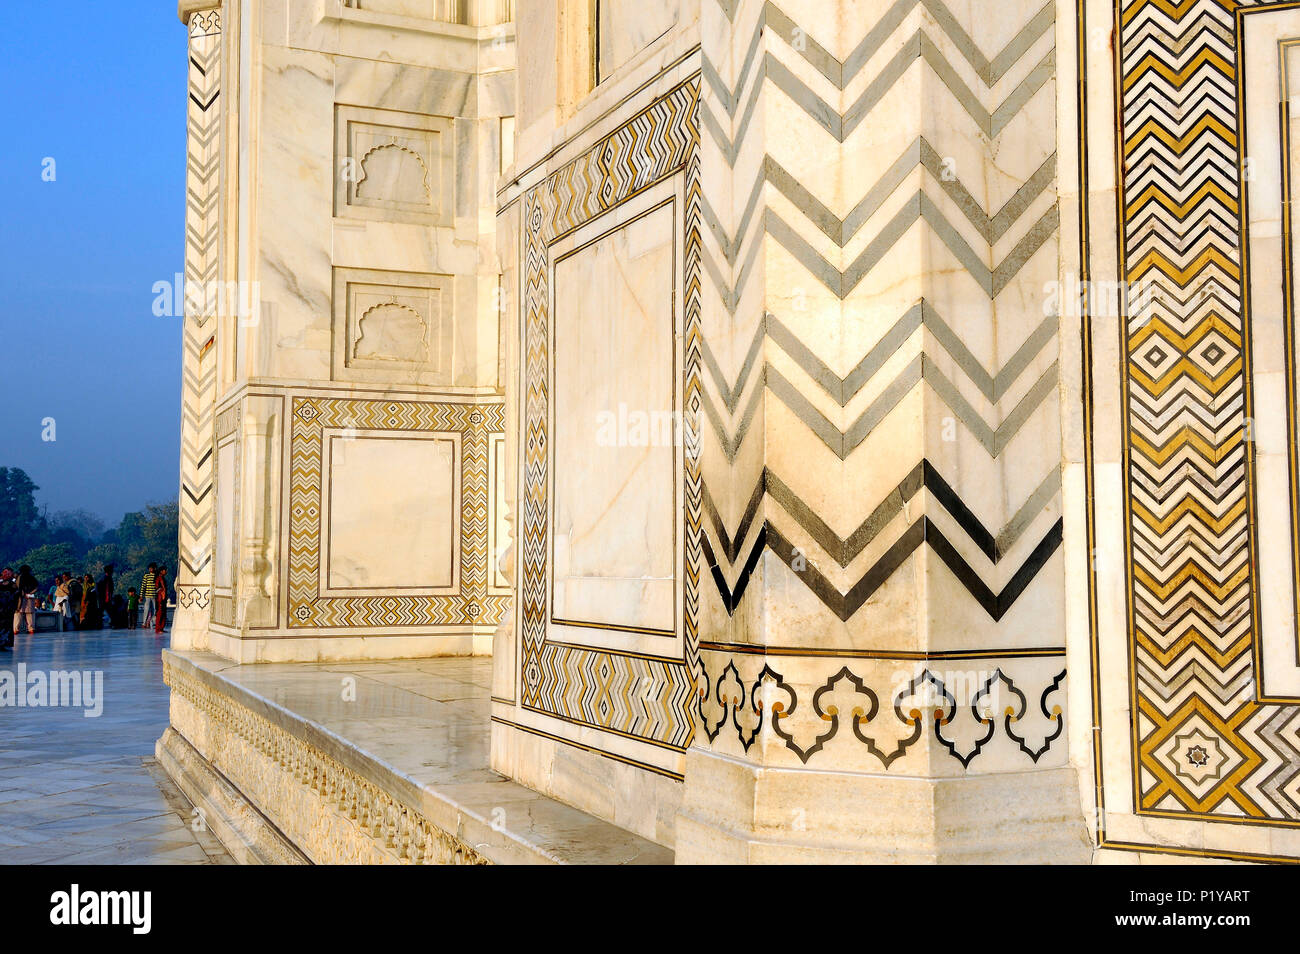 India, Agra, Taj Mahal, close-up view of encrusted hard stones on ...